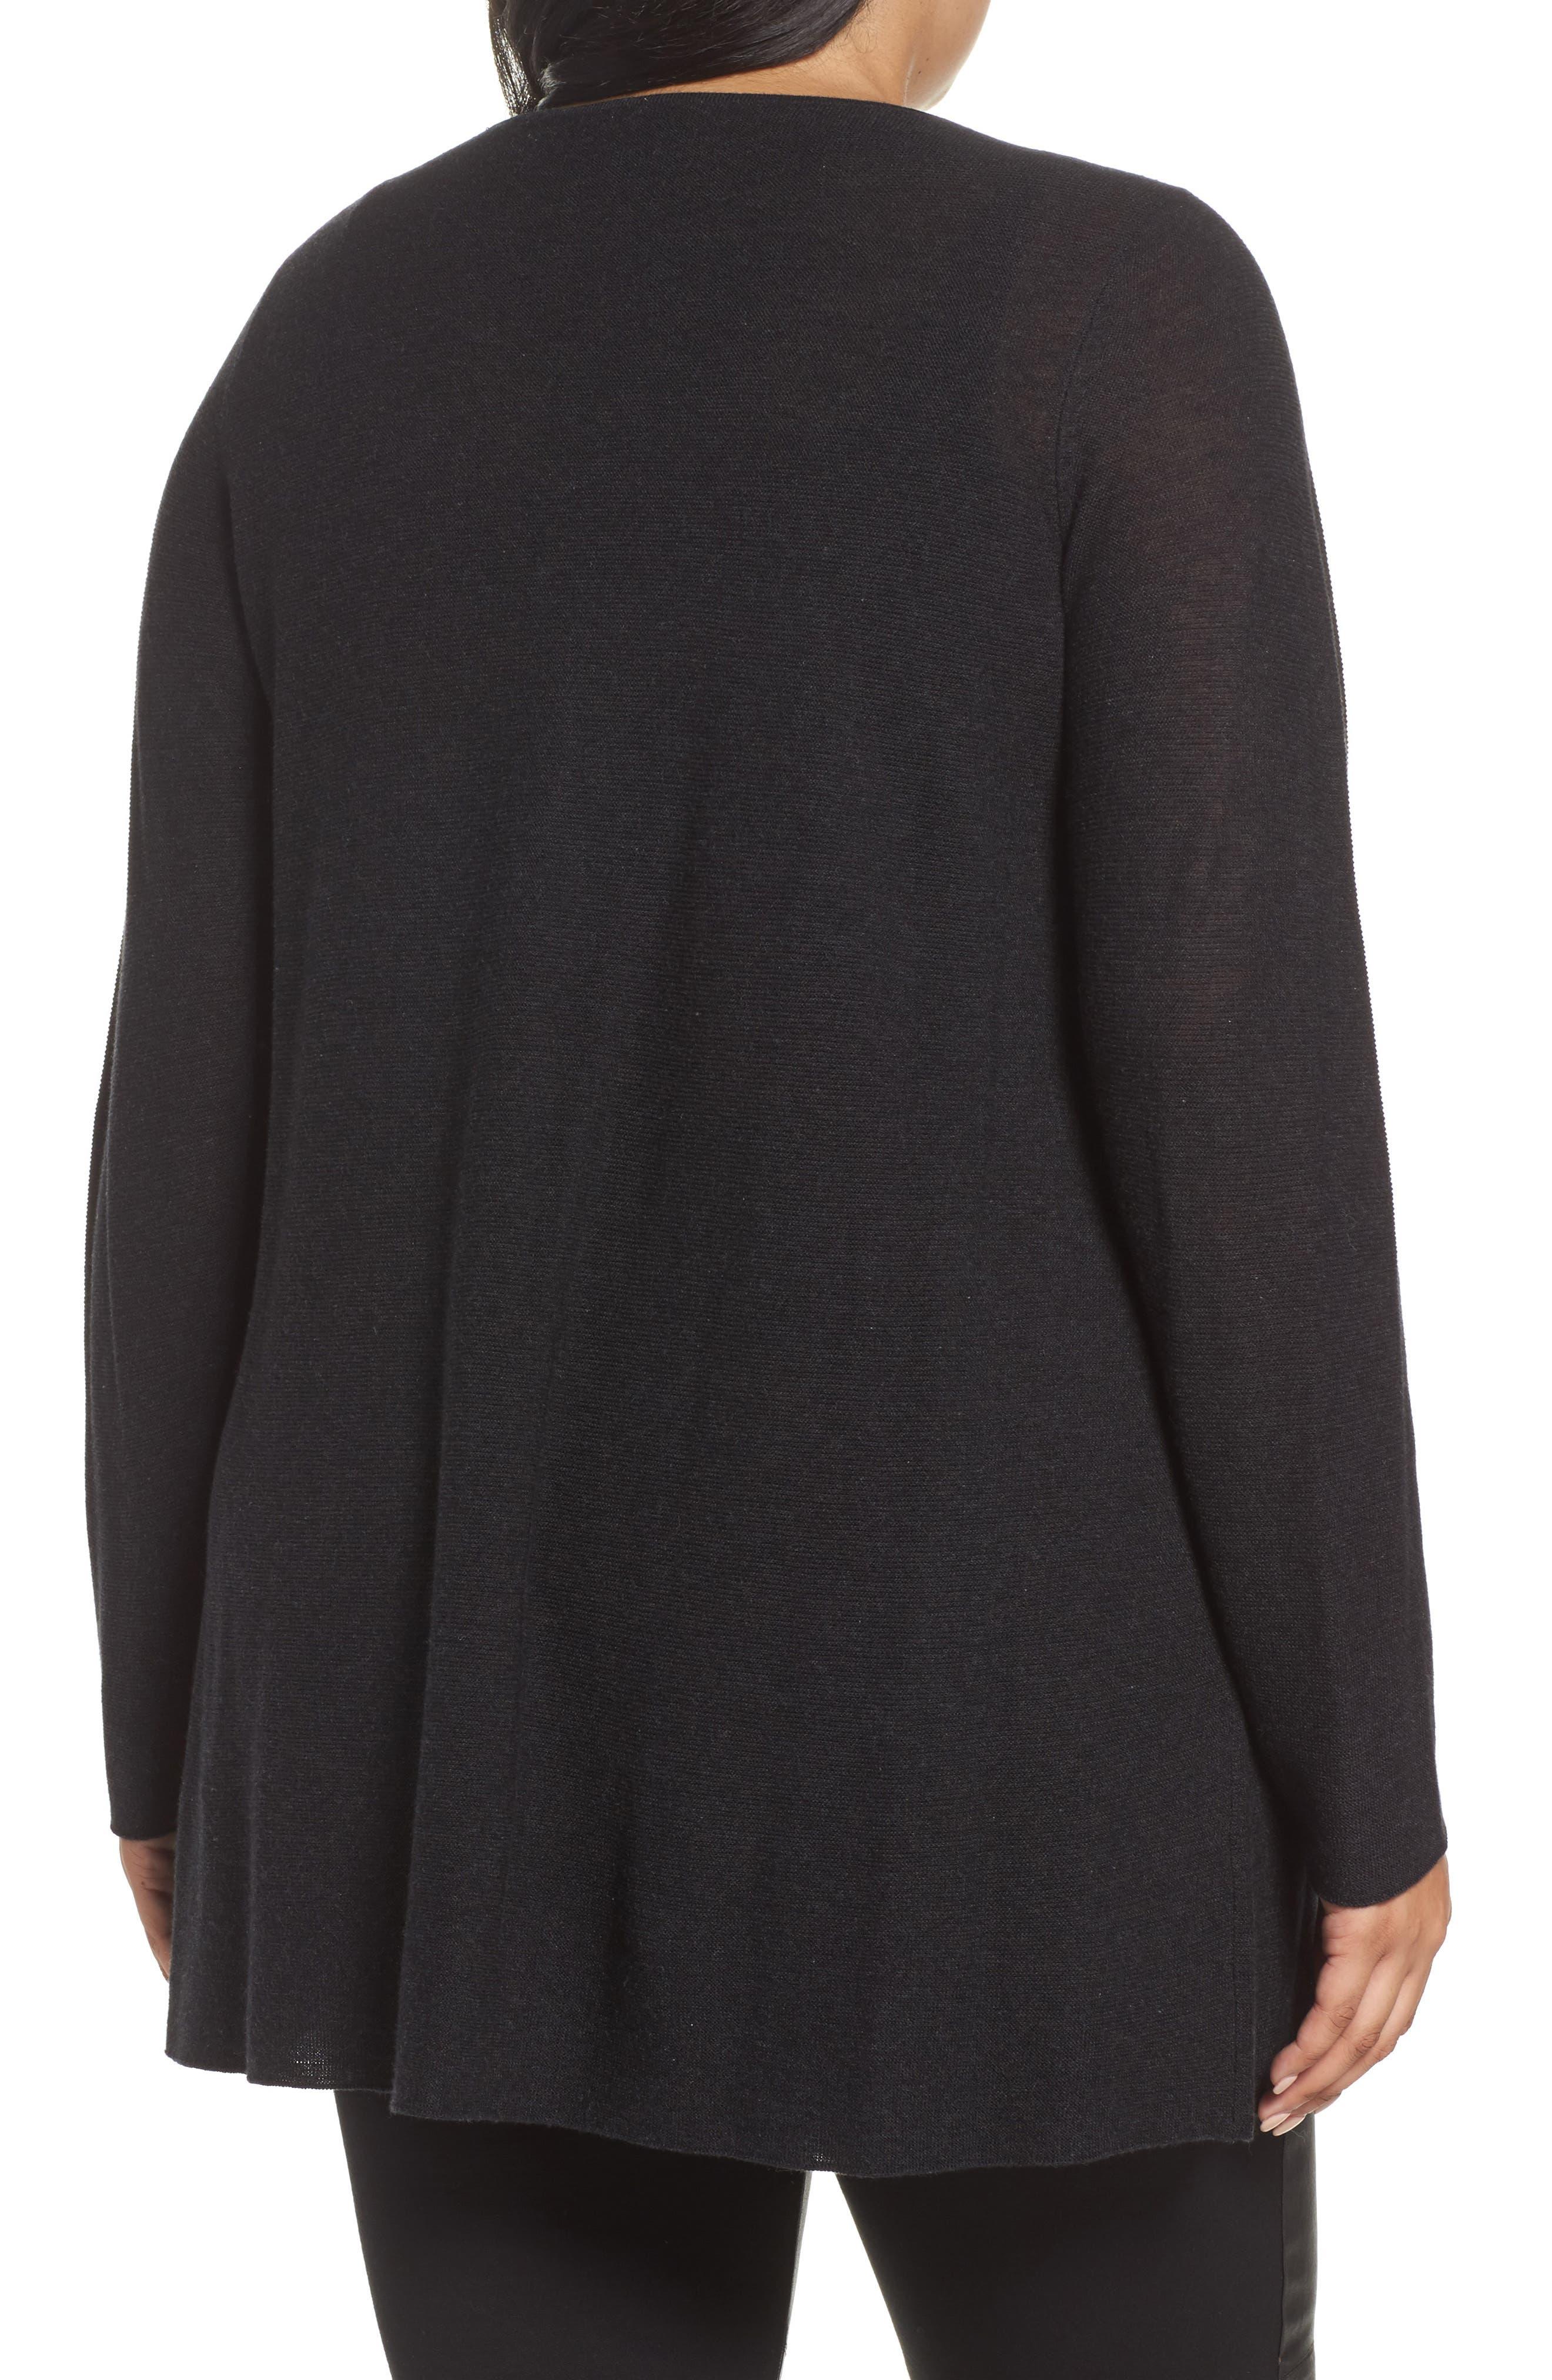 Alternate Image 2  - Eileen Fisher Jewel Neck Tunic Sweater (Plus Size)